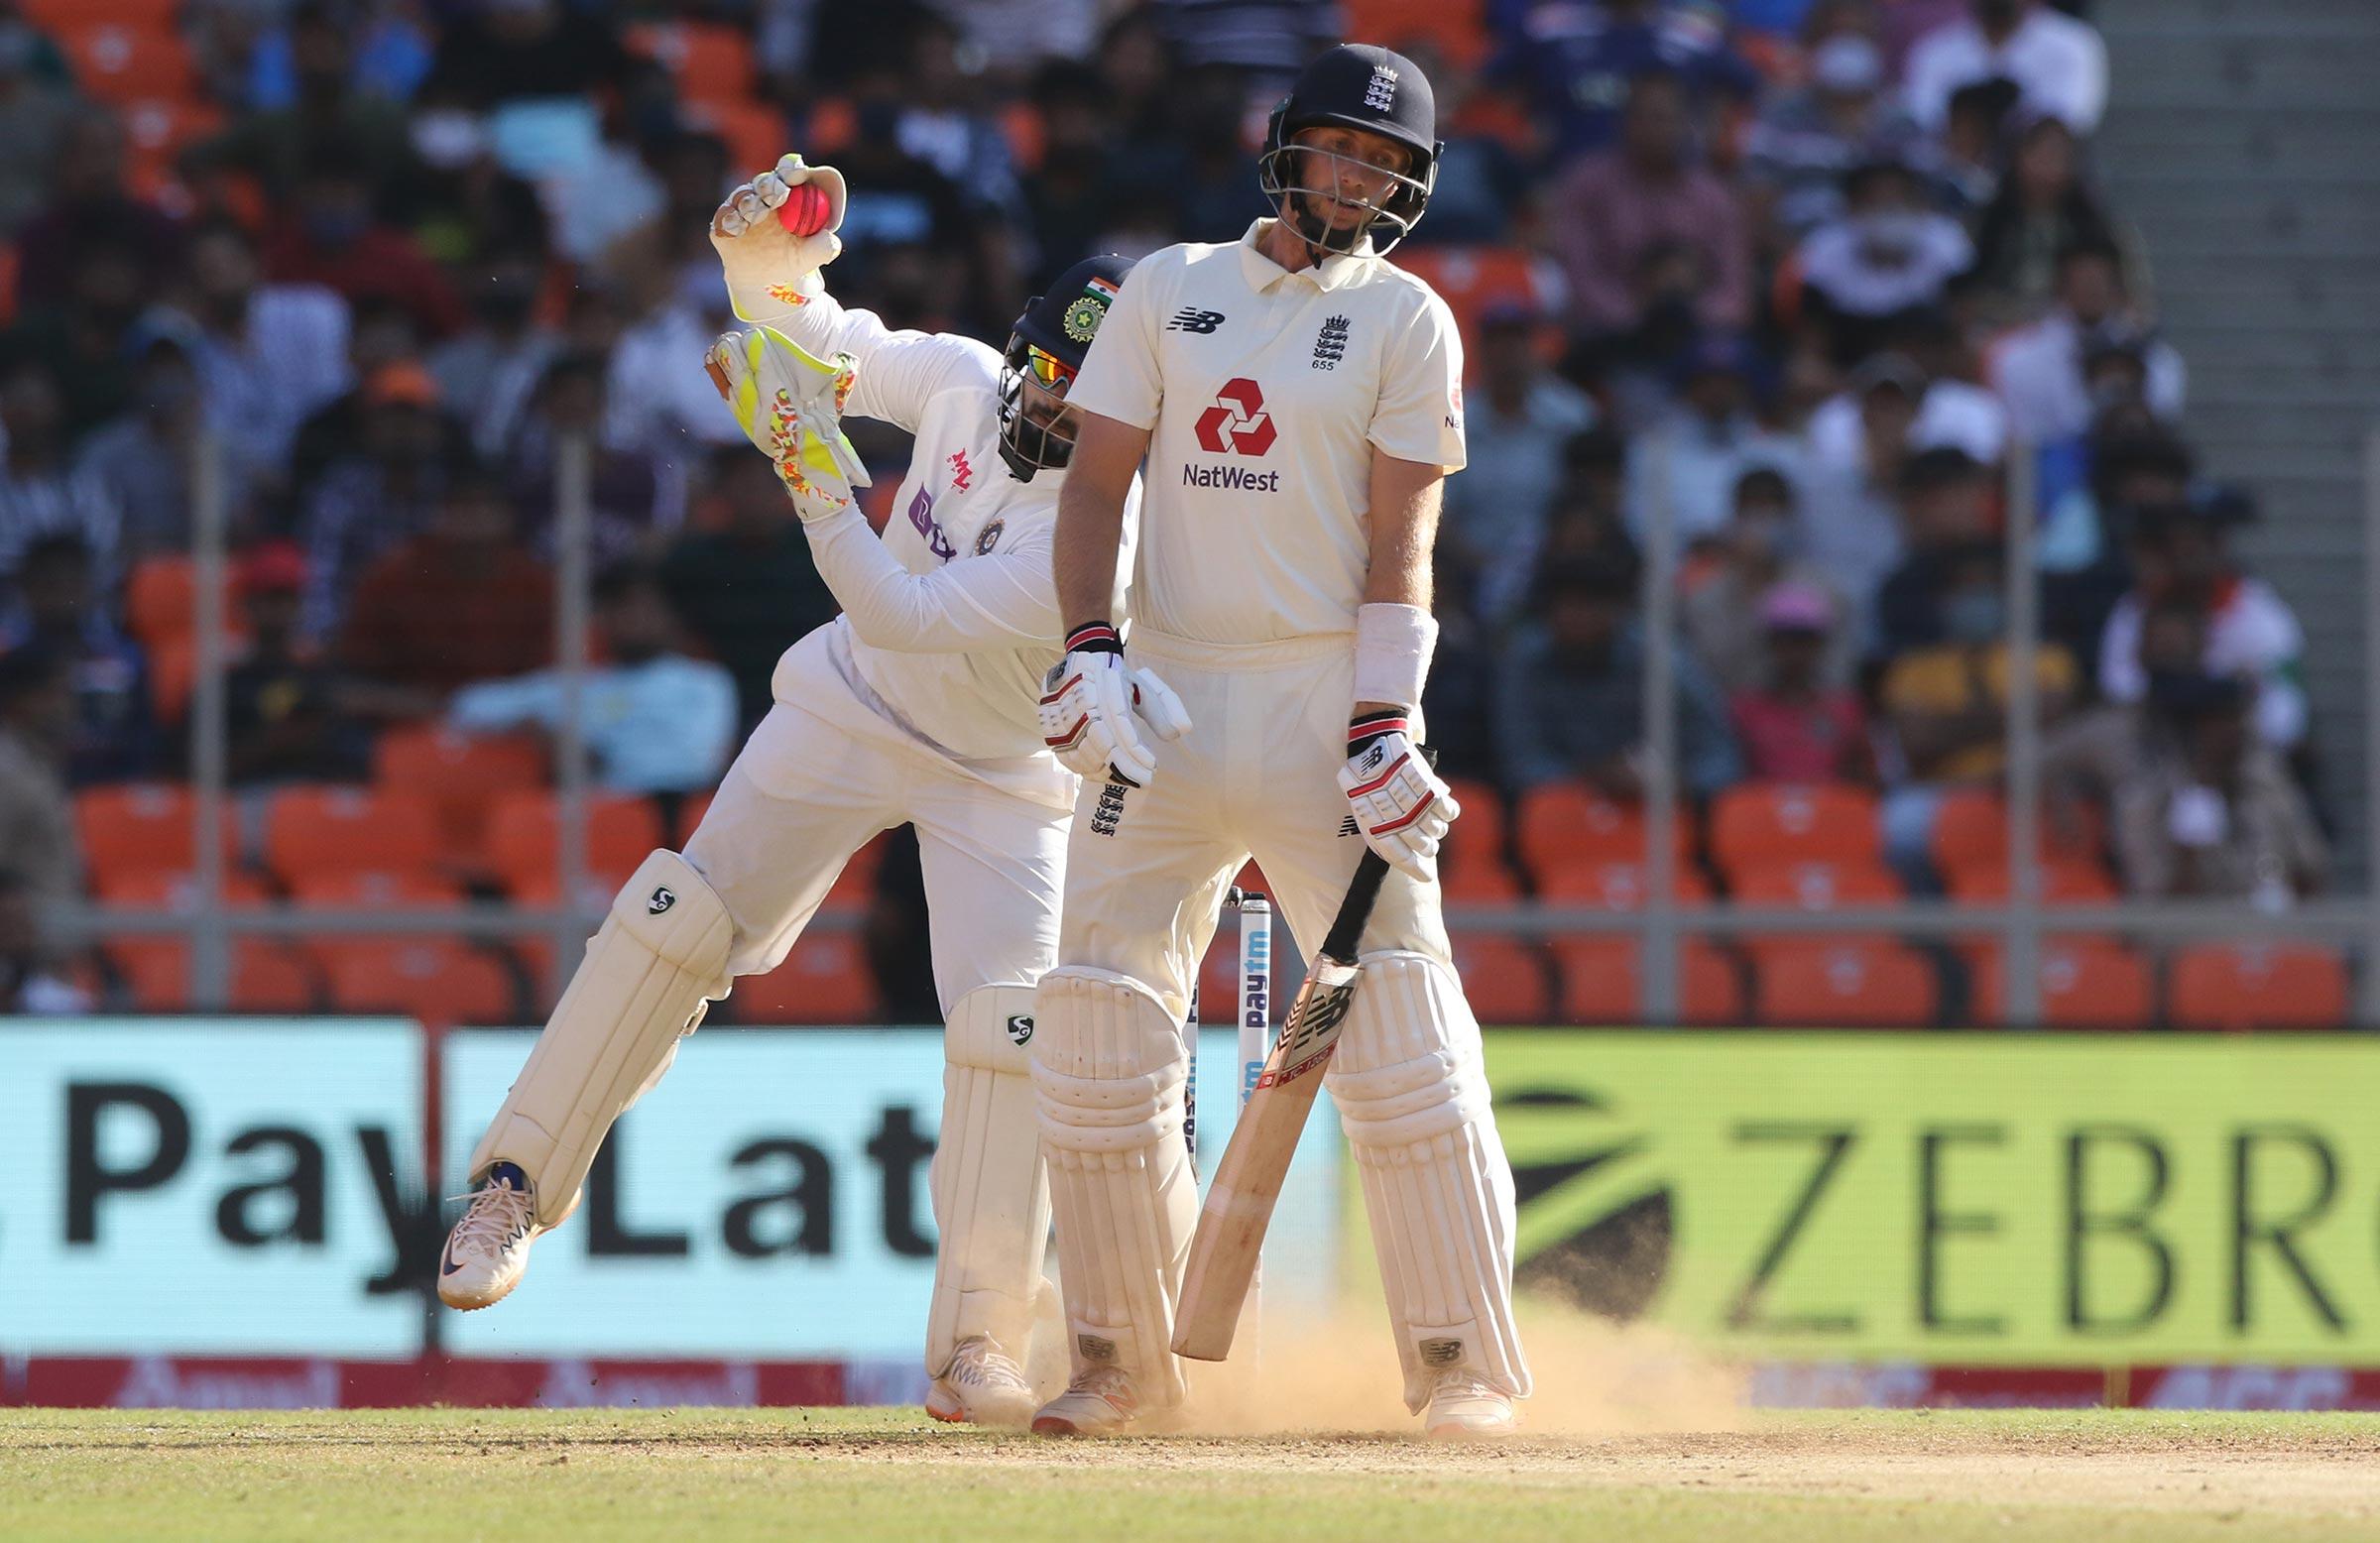 Joe Root takes action as Rishabh Pant takes the ball above his head // BCCI-Sportzpics